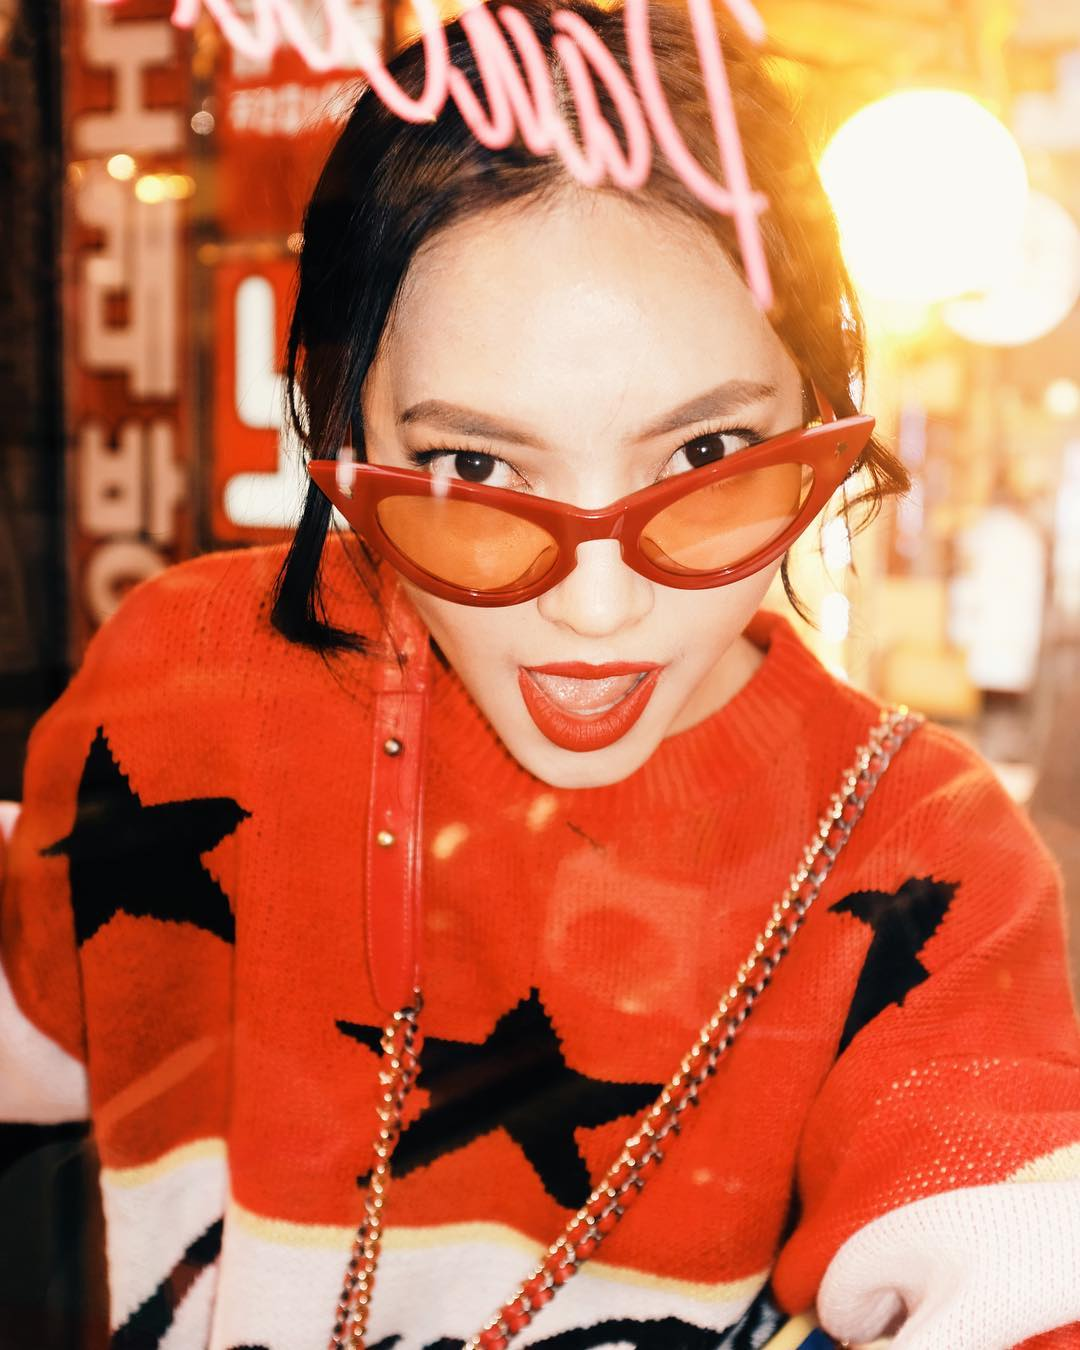 chau-bui-kinh-hoa-tiet-ngam-nghia-street-style-cua-sao-viet-tai-seoul-fashion-week